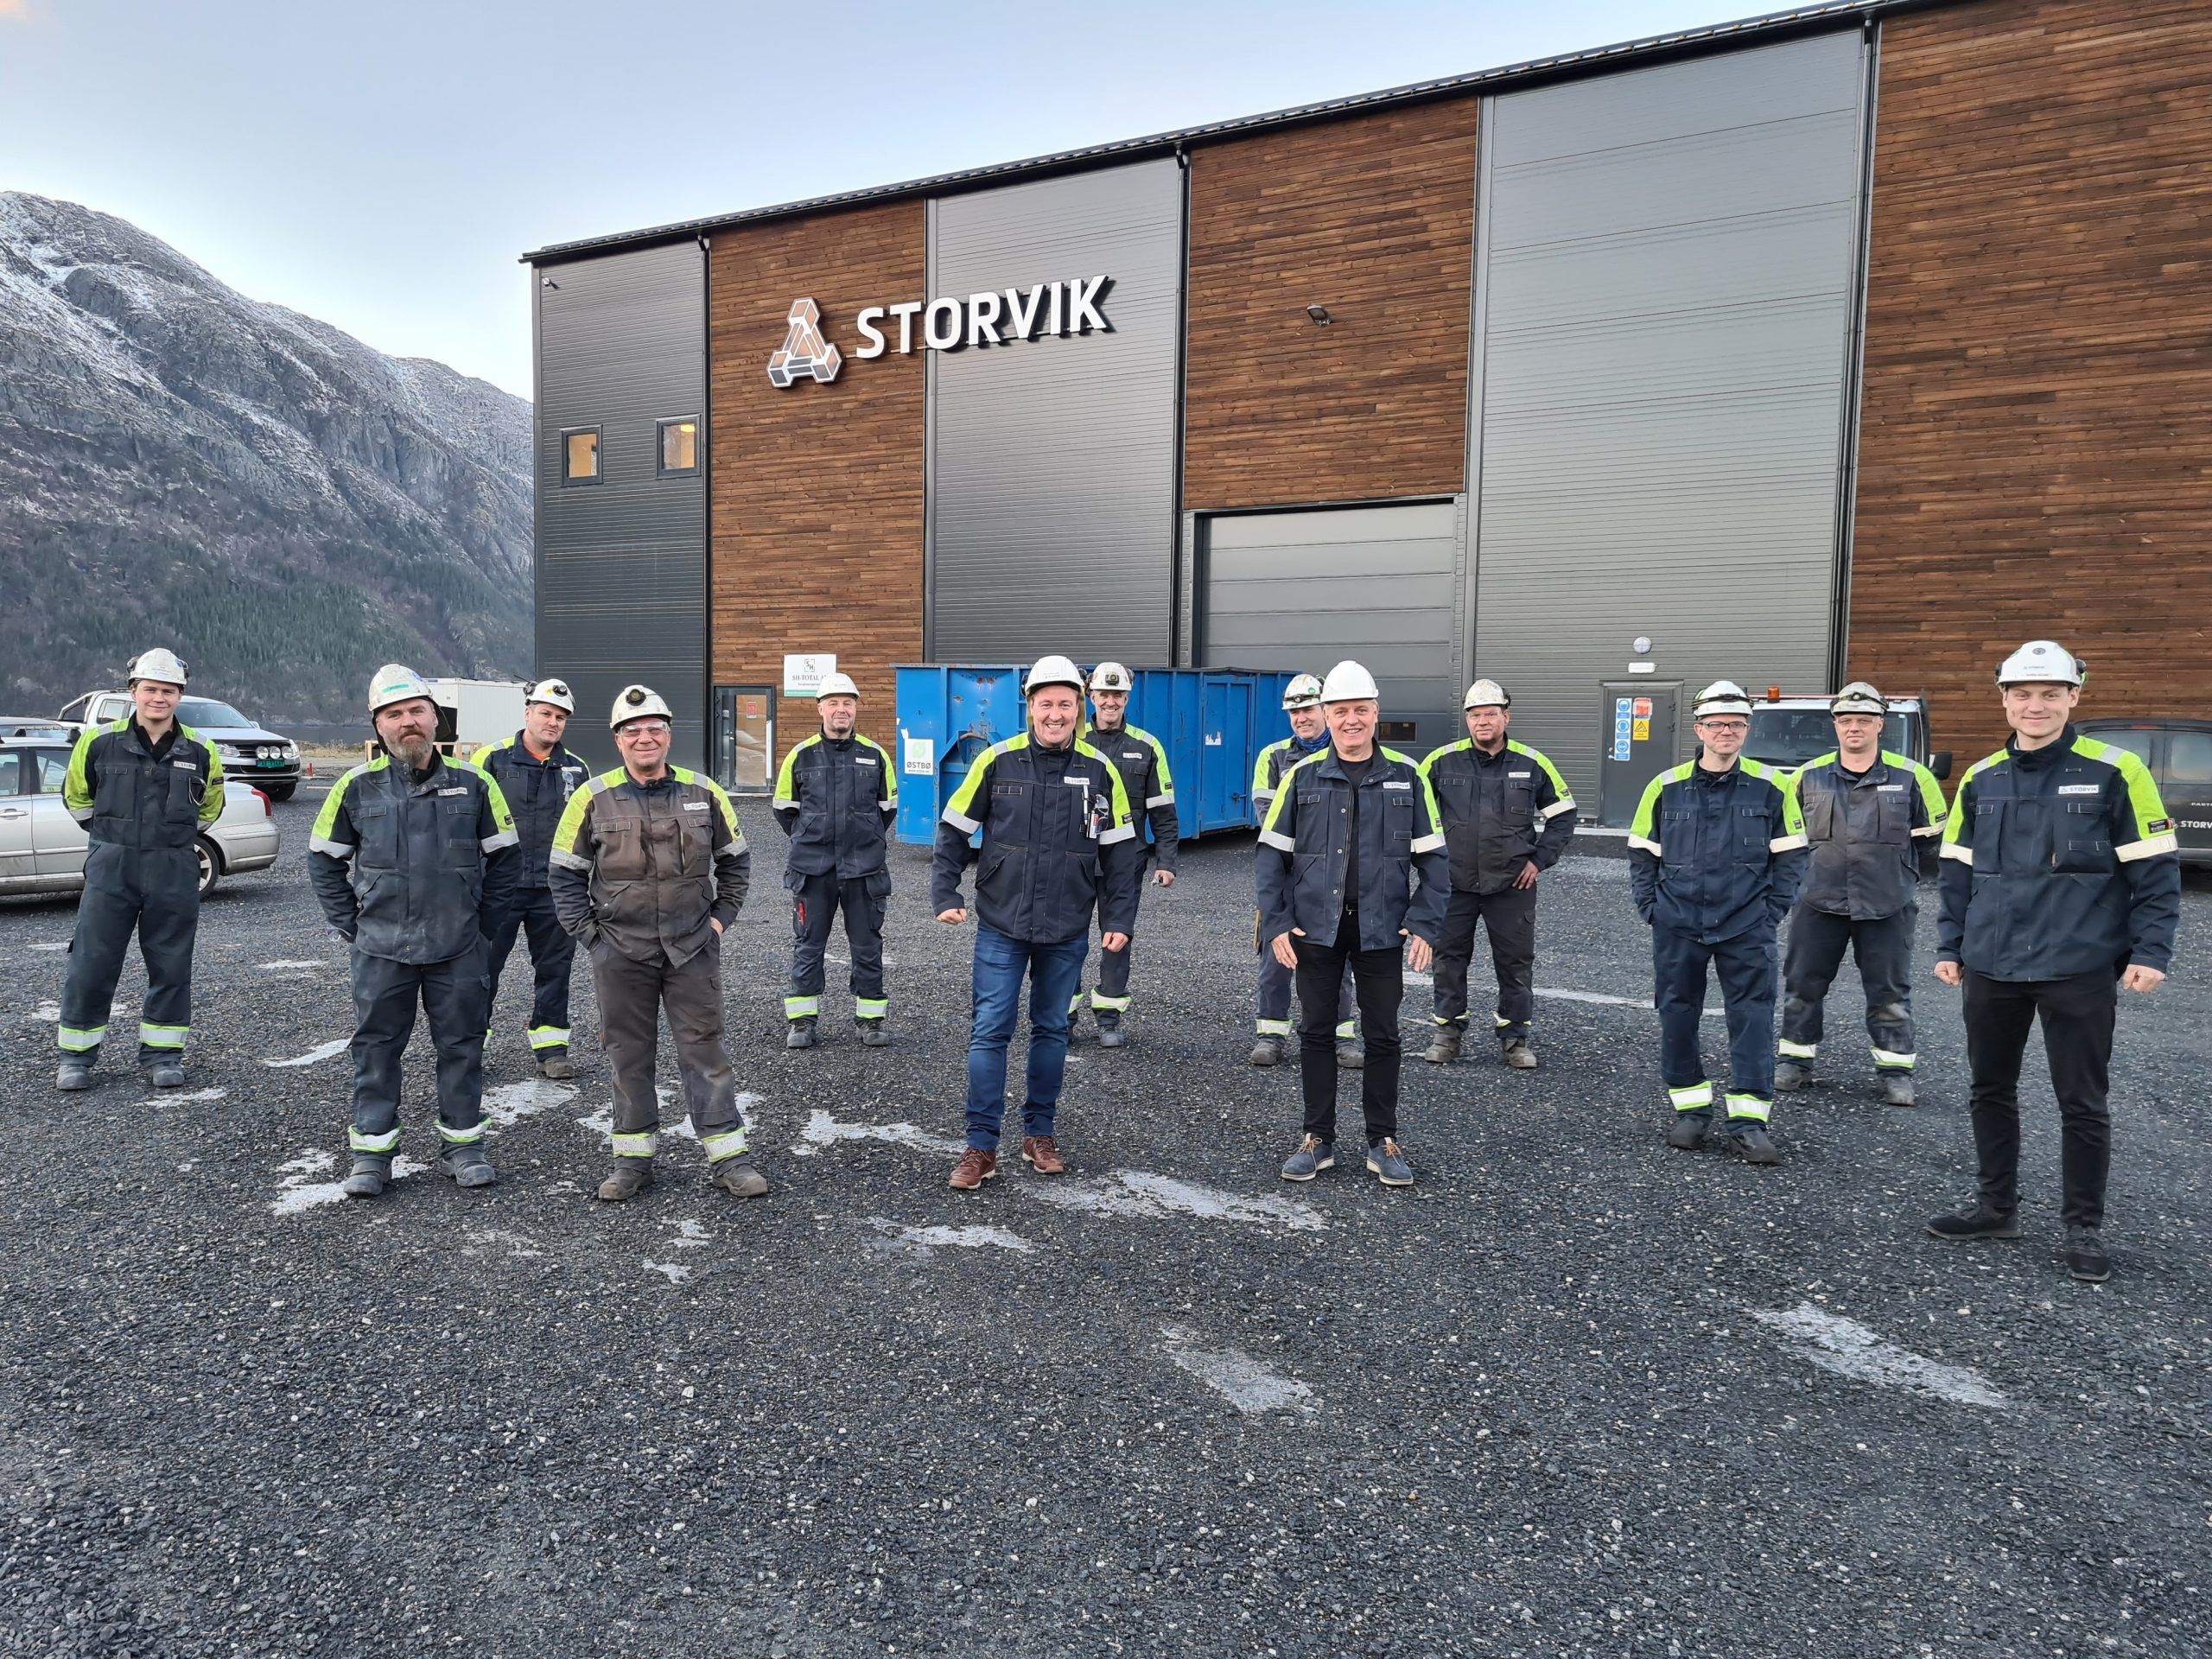 Storvik opens new mechanical workshop in Mosjøen